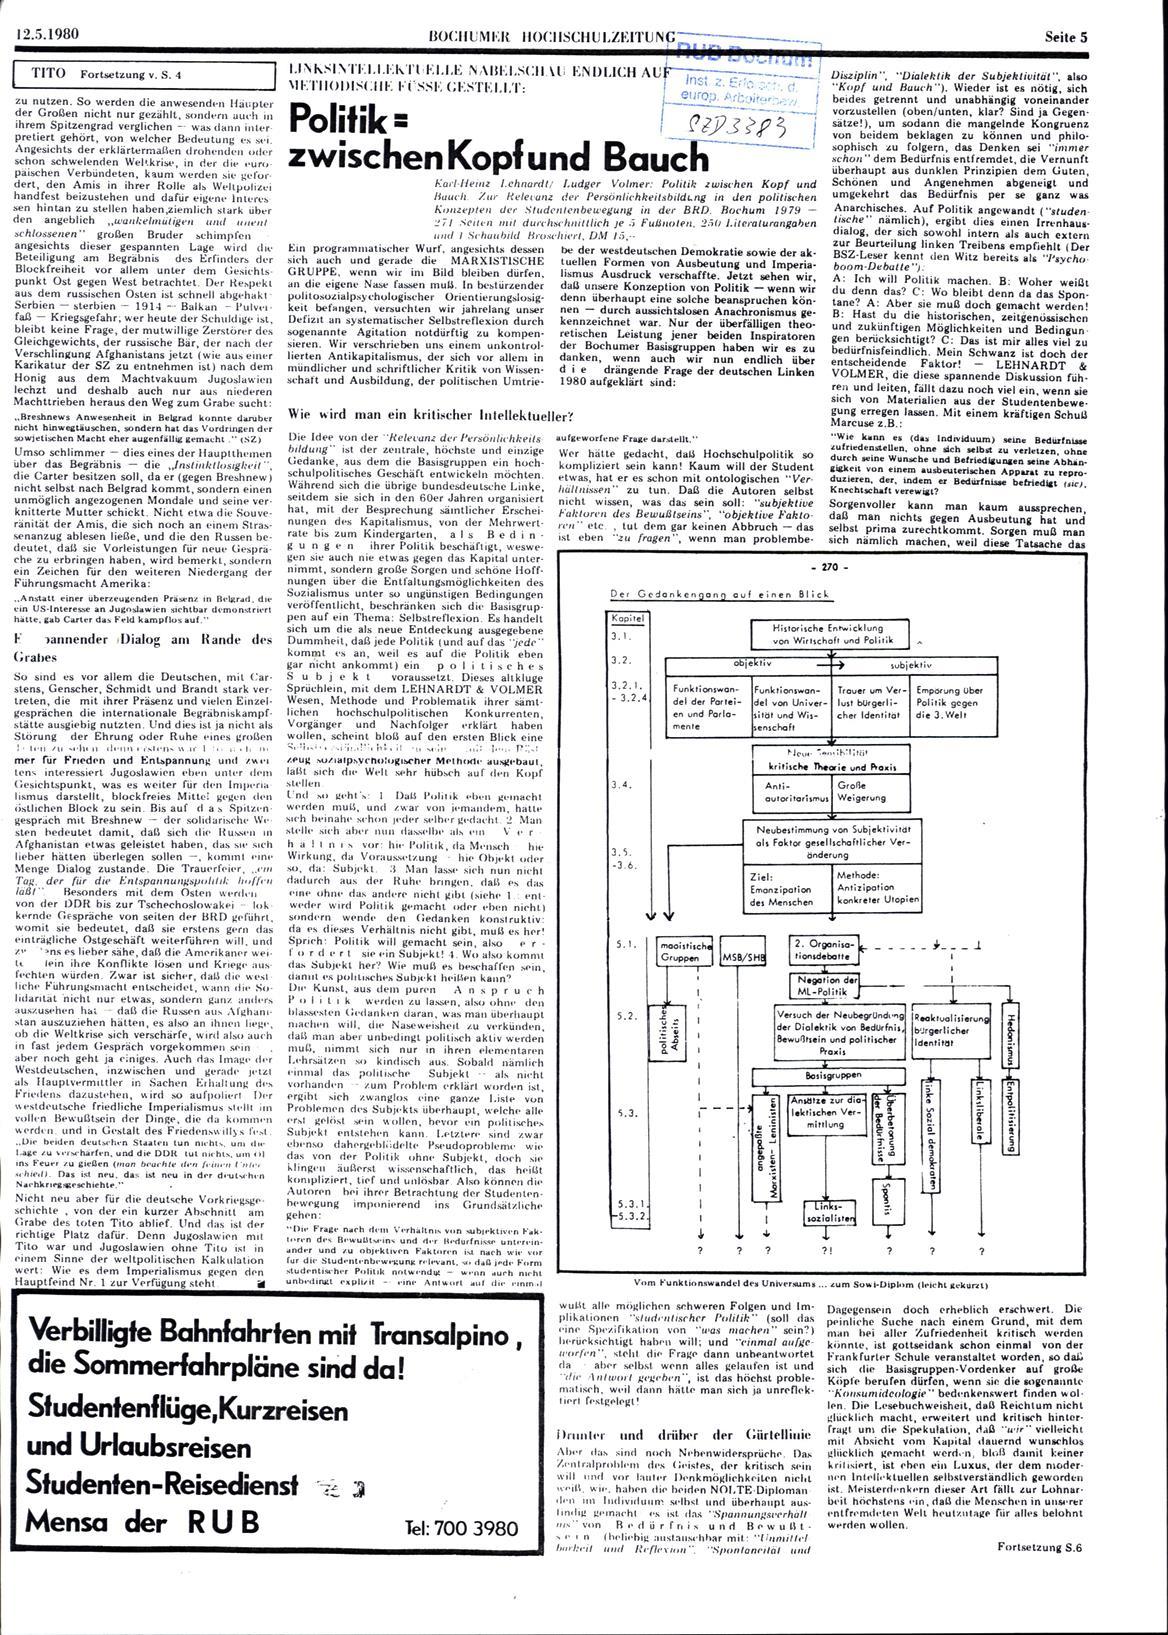 Bochum_BHZ_19800512_012_005